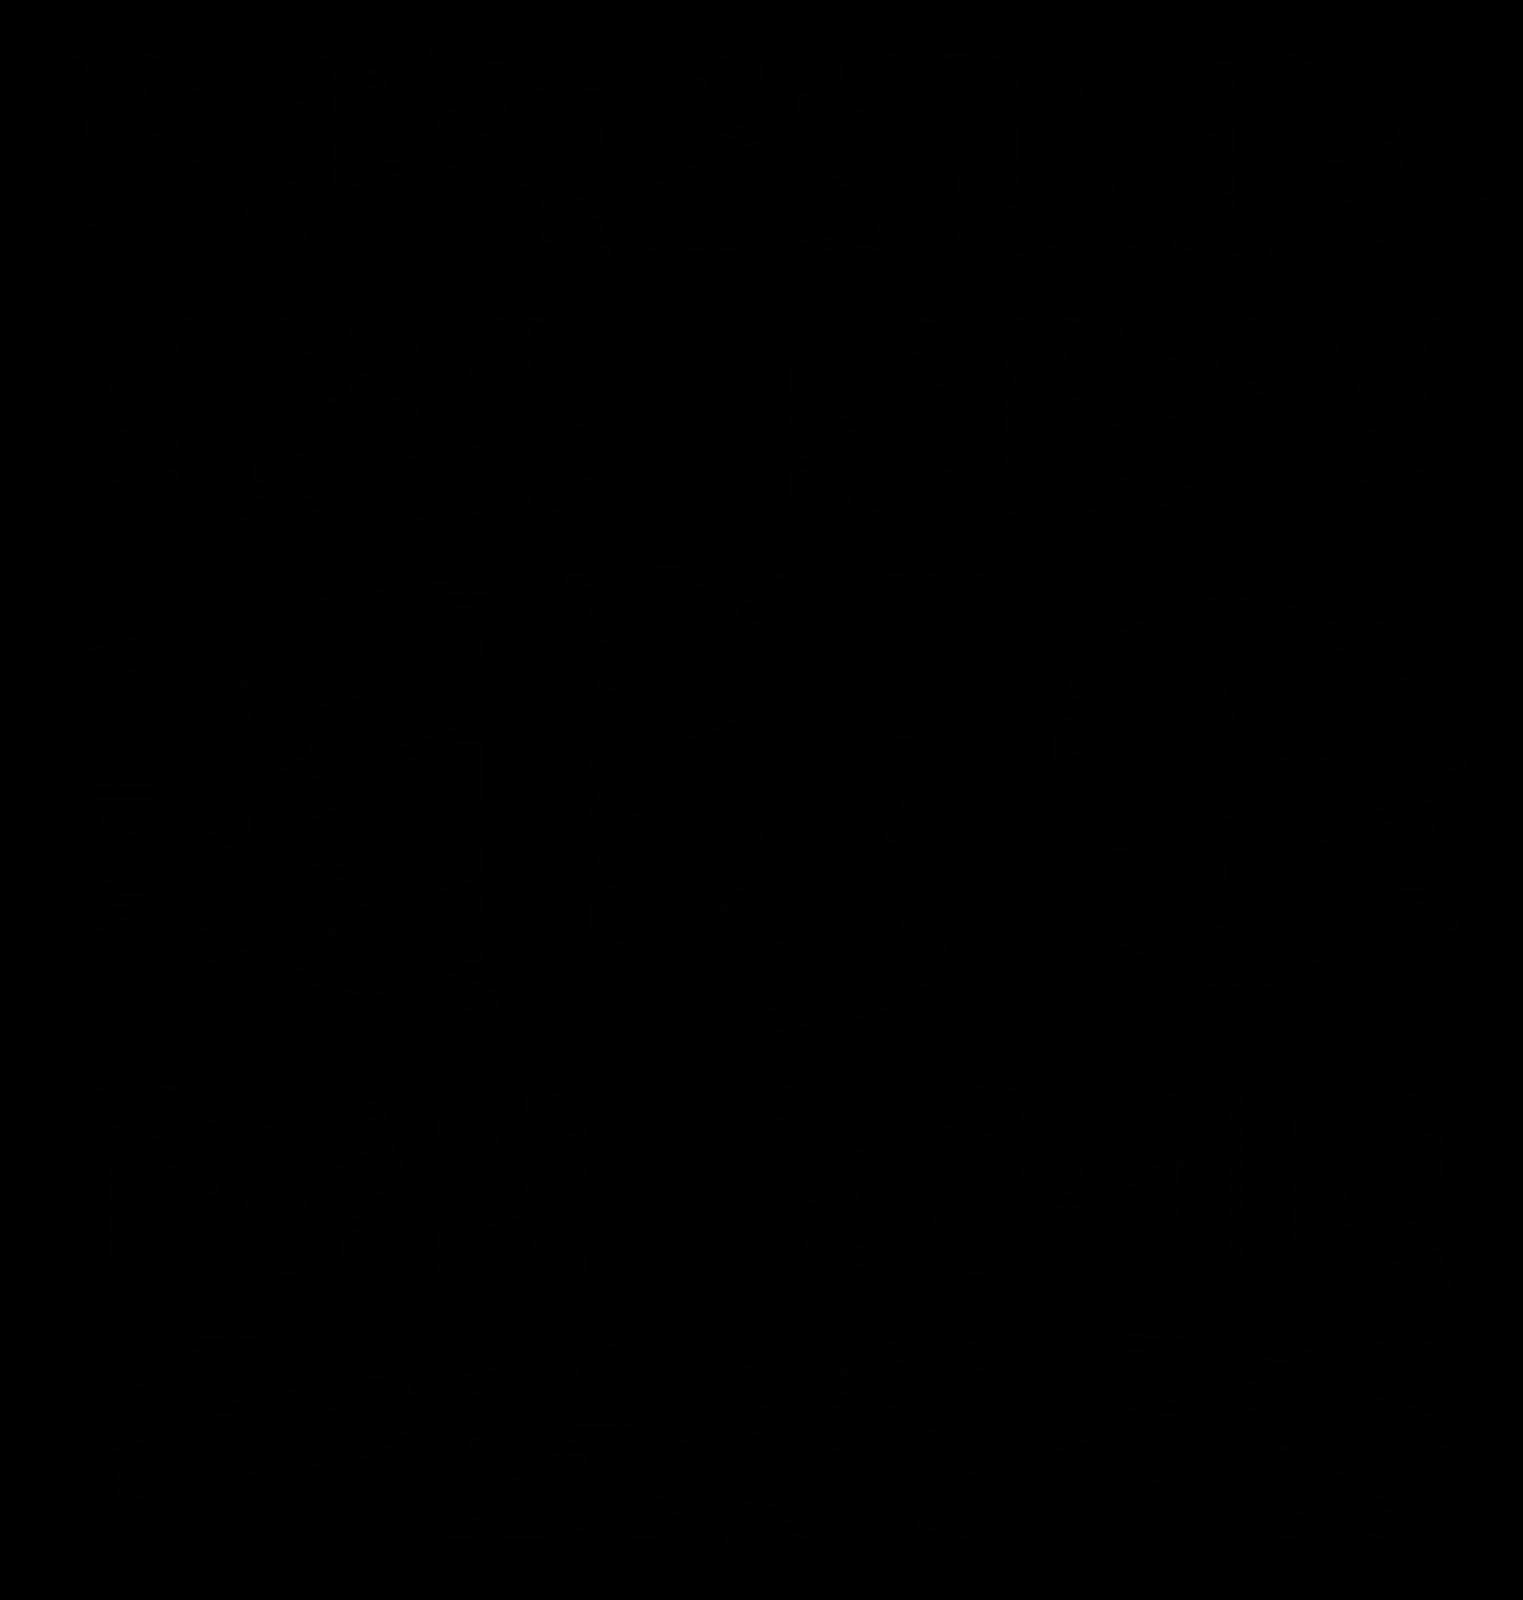 Usage Statistics for www.cirp.org - November 2017 - Referrer